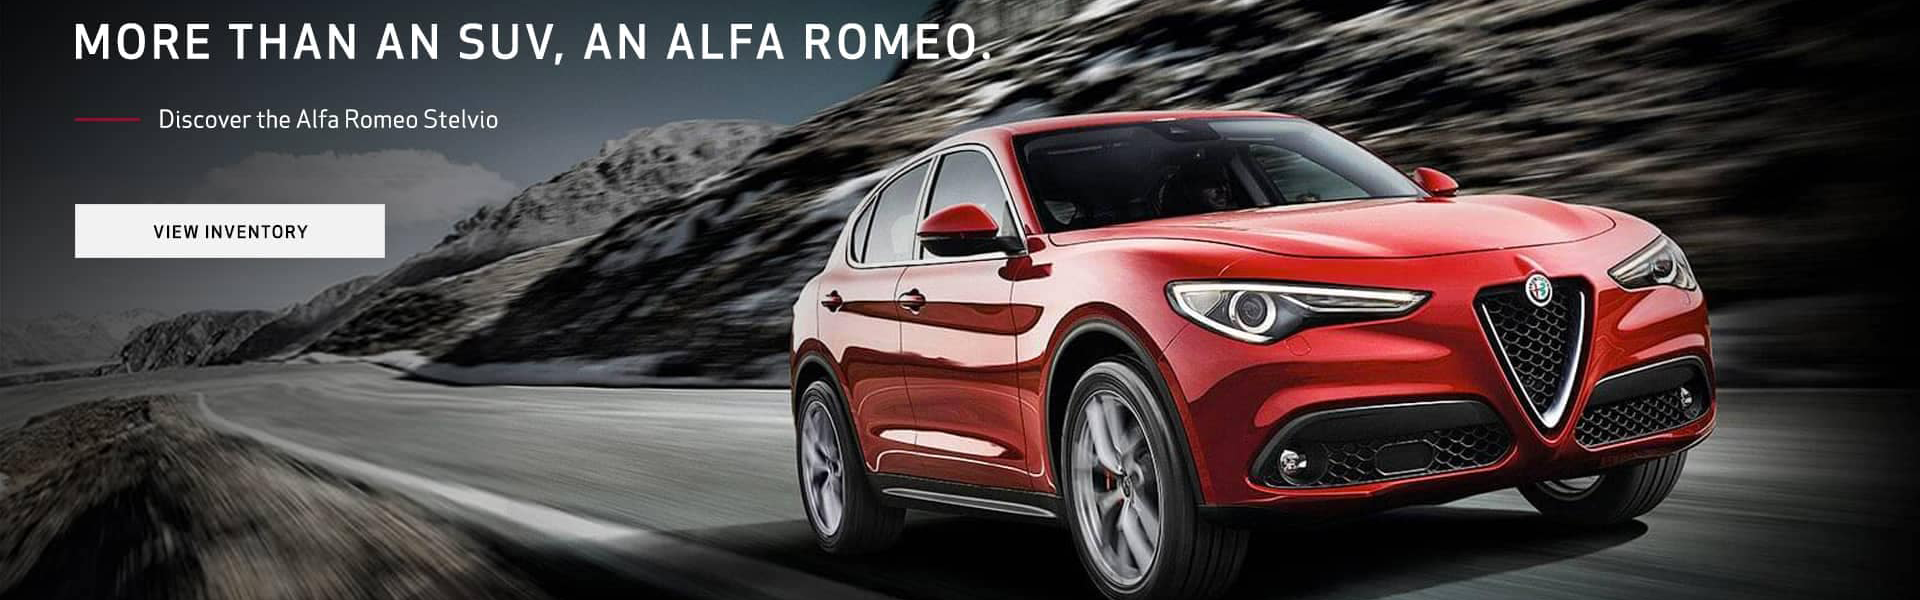 More than an SUV, an Alfa Romeo. View inventory.